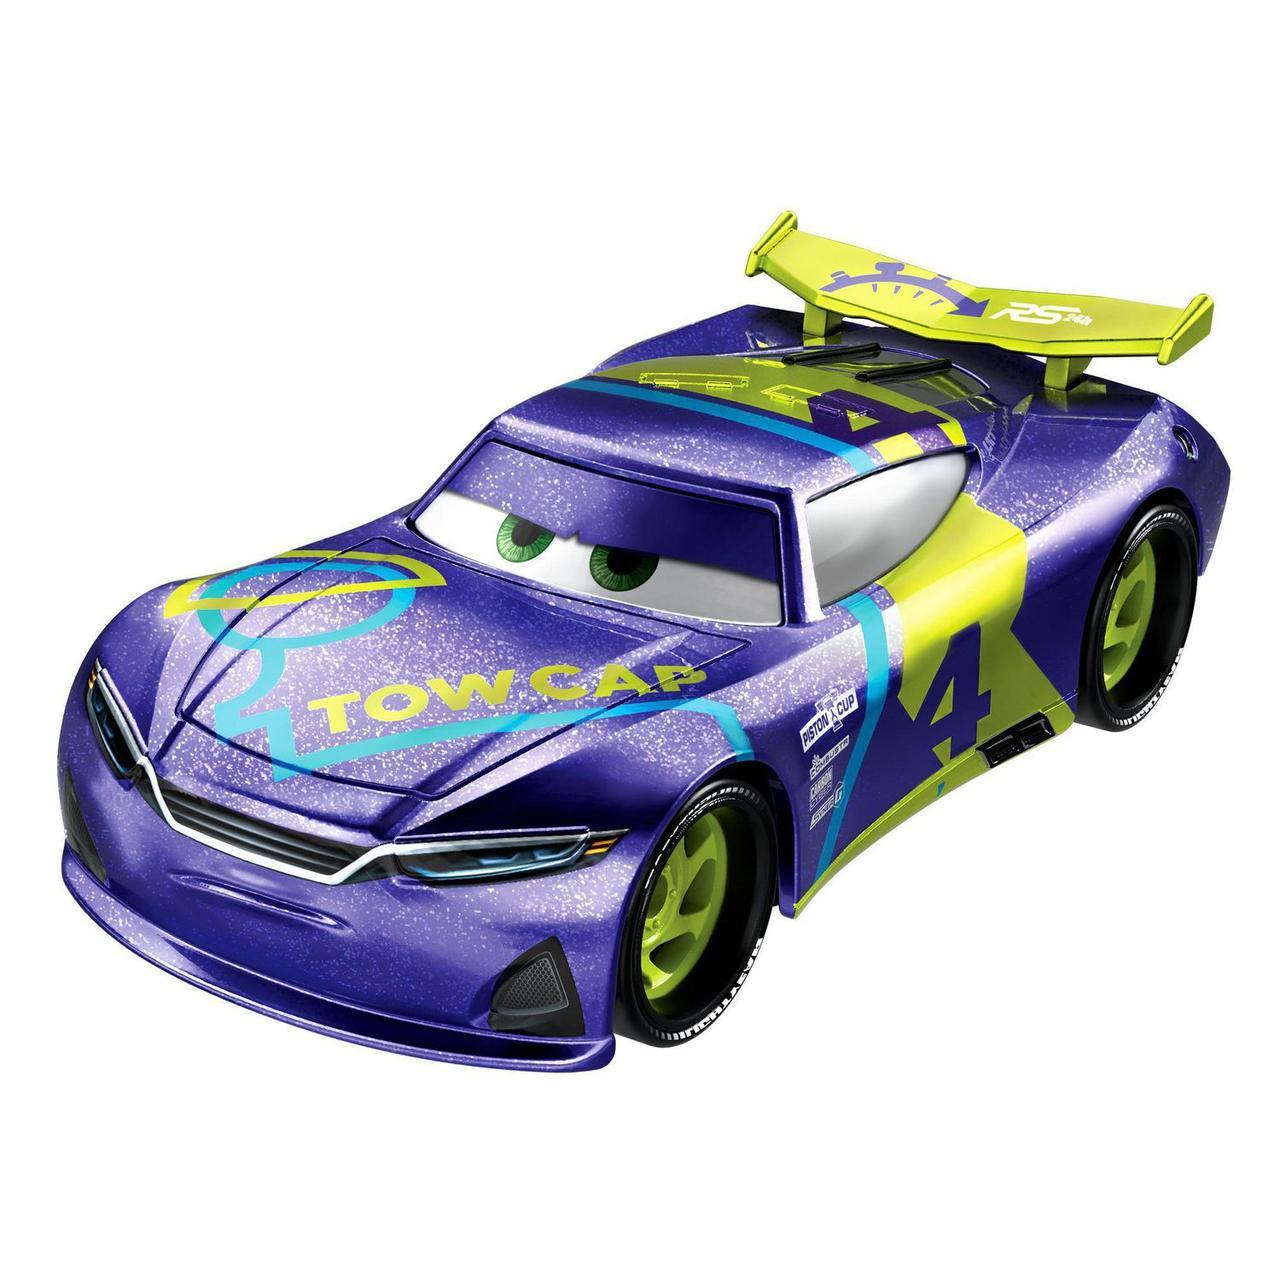 "Cars / Тачки ""Гонка на выносливость RS 24"" Д.Ж.МакПиллар №4"